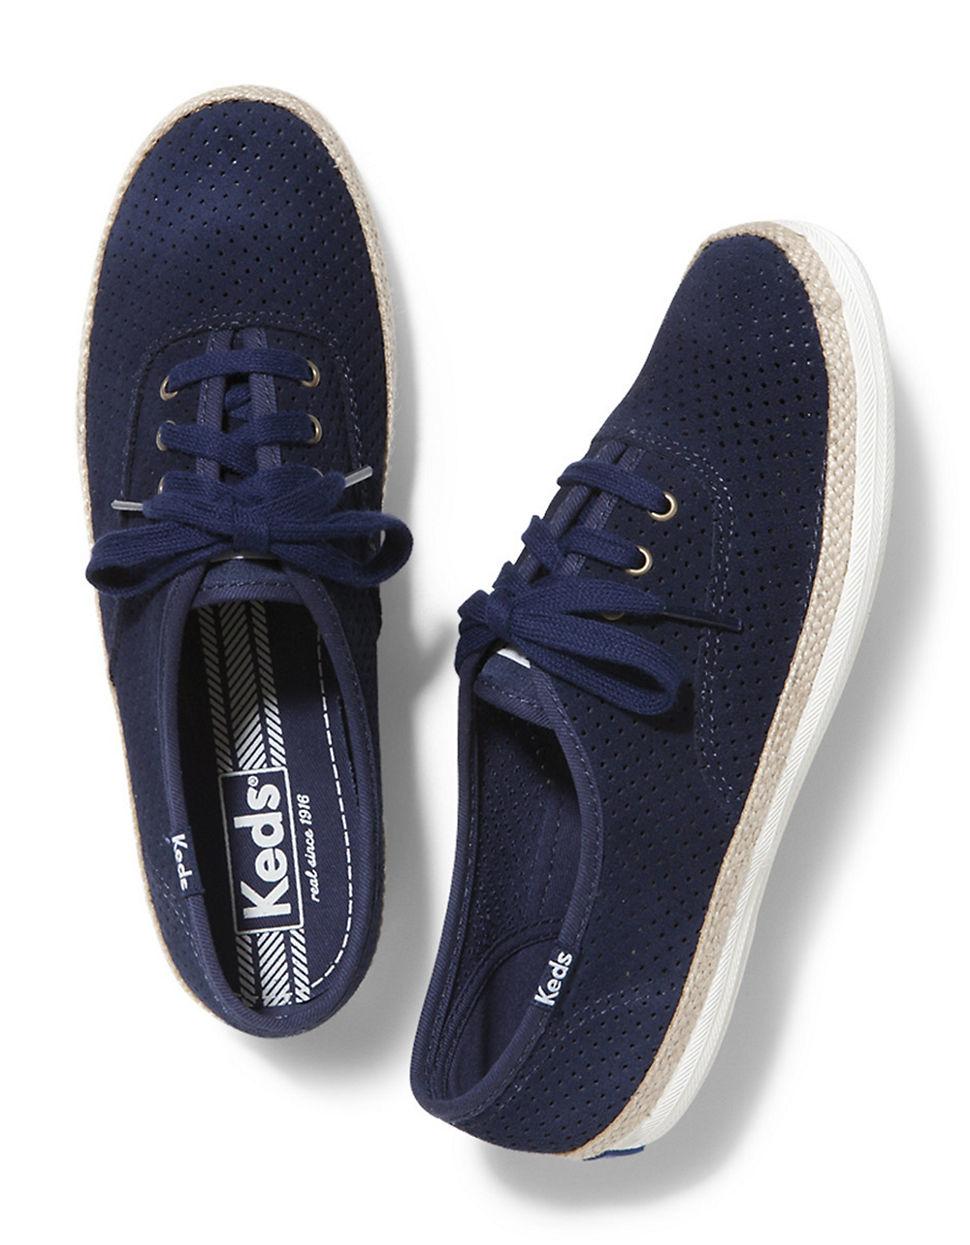 Keds Bone Leather Shoes